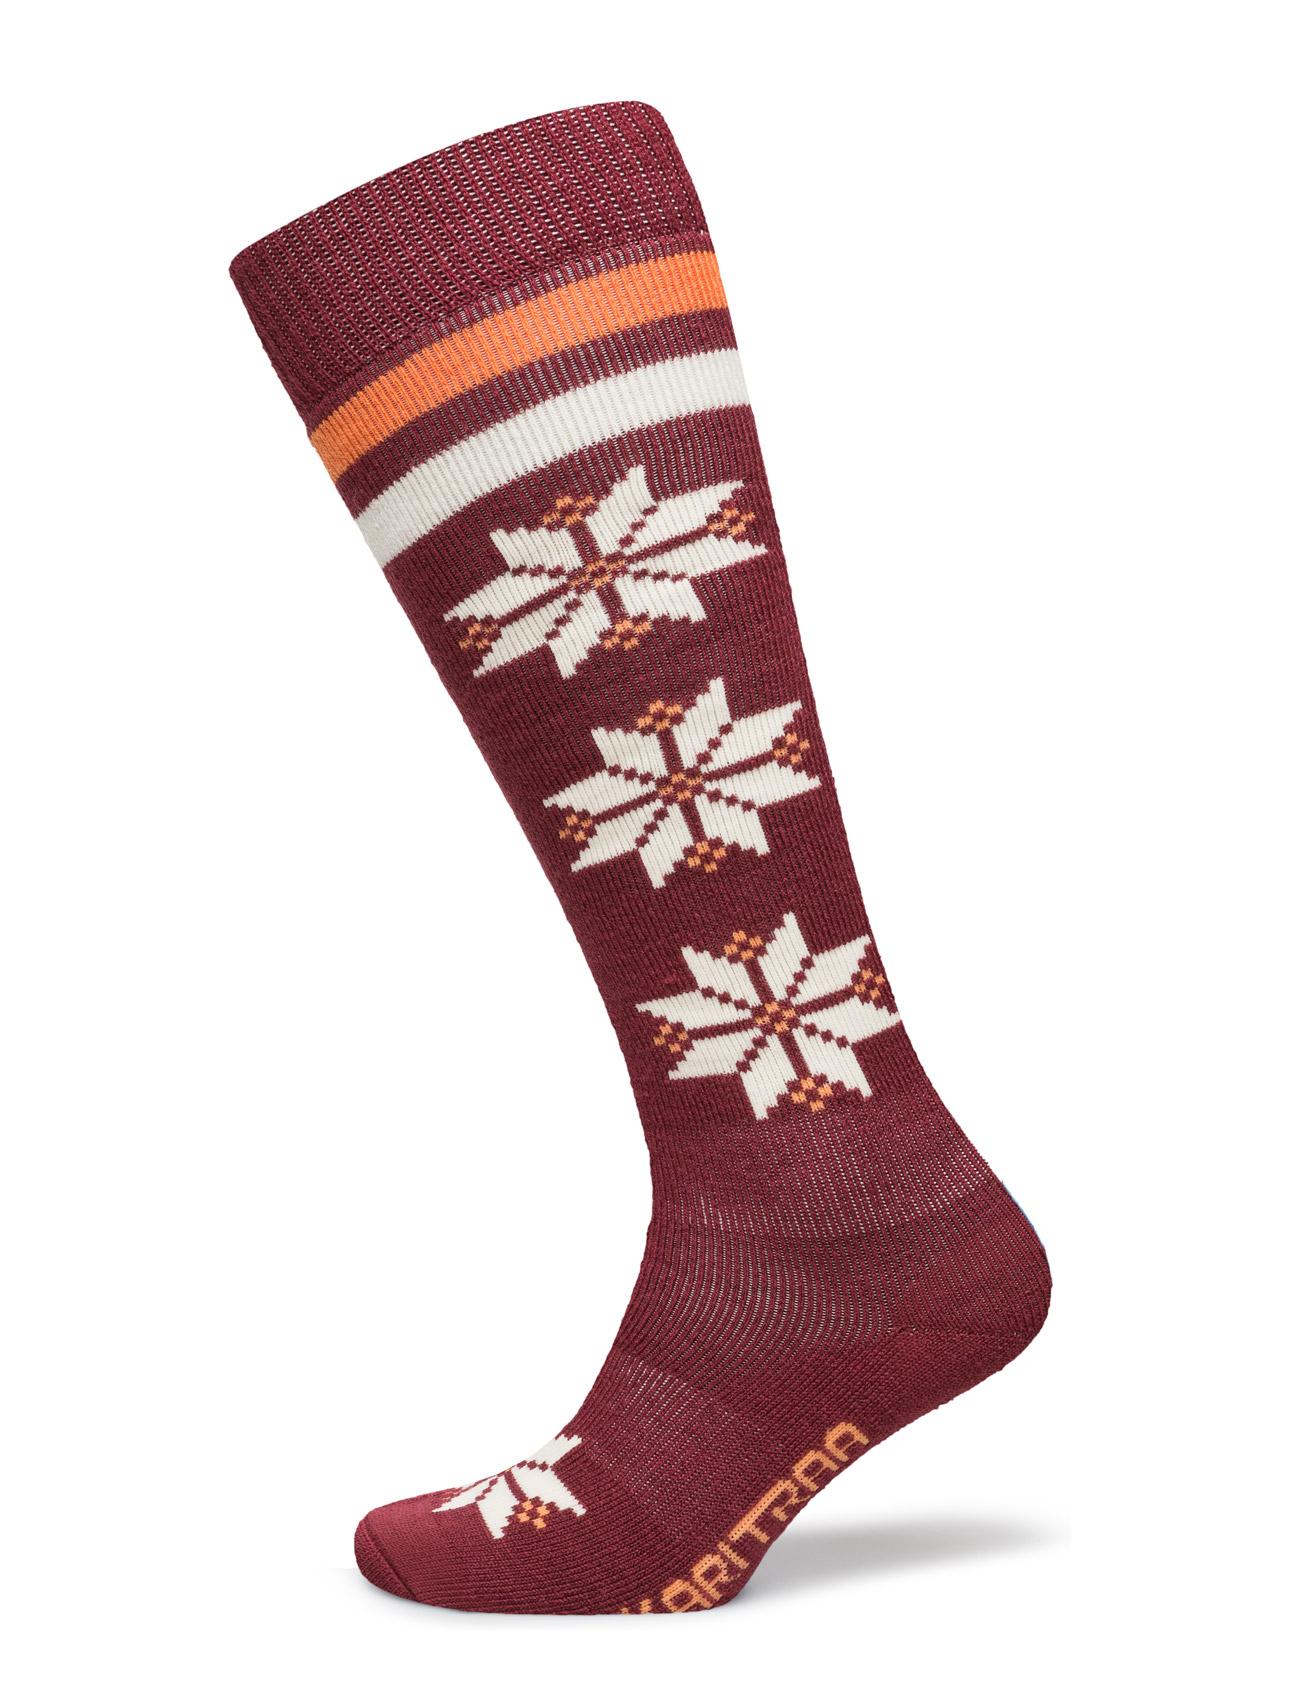 TÅTil Sock Kari Traa Sports undertøj til Kvinder i Blomme